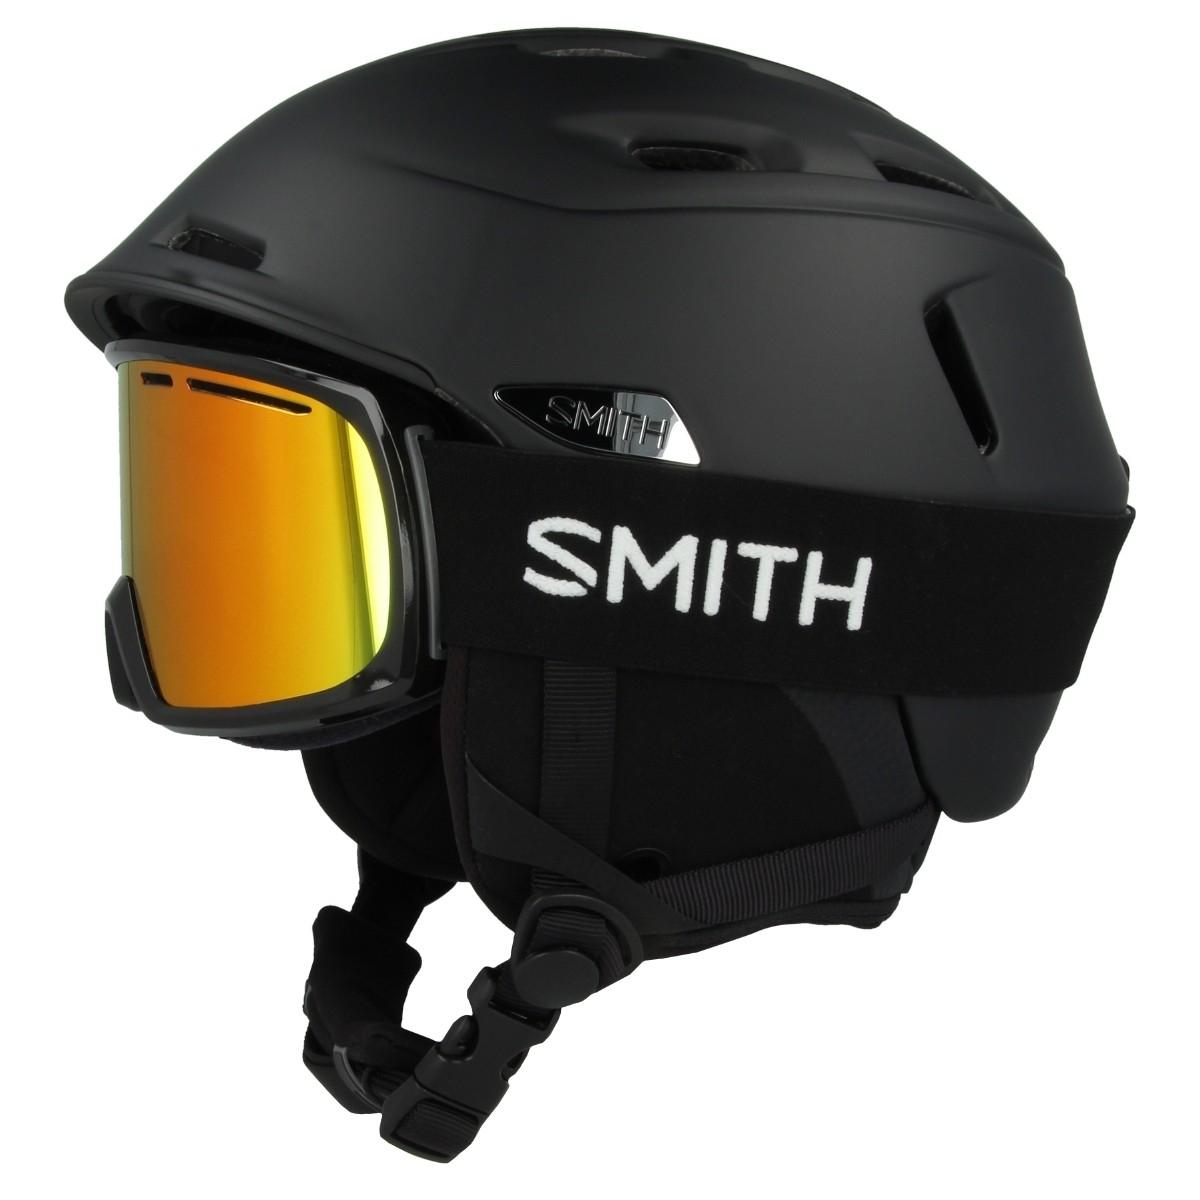 Smith Camber Range Integrated Combo Pack // Skihelm & Skibrille - Schwarz - M, L